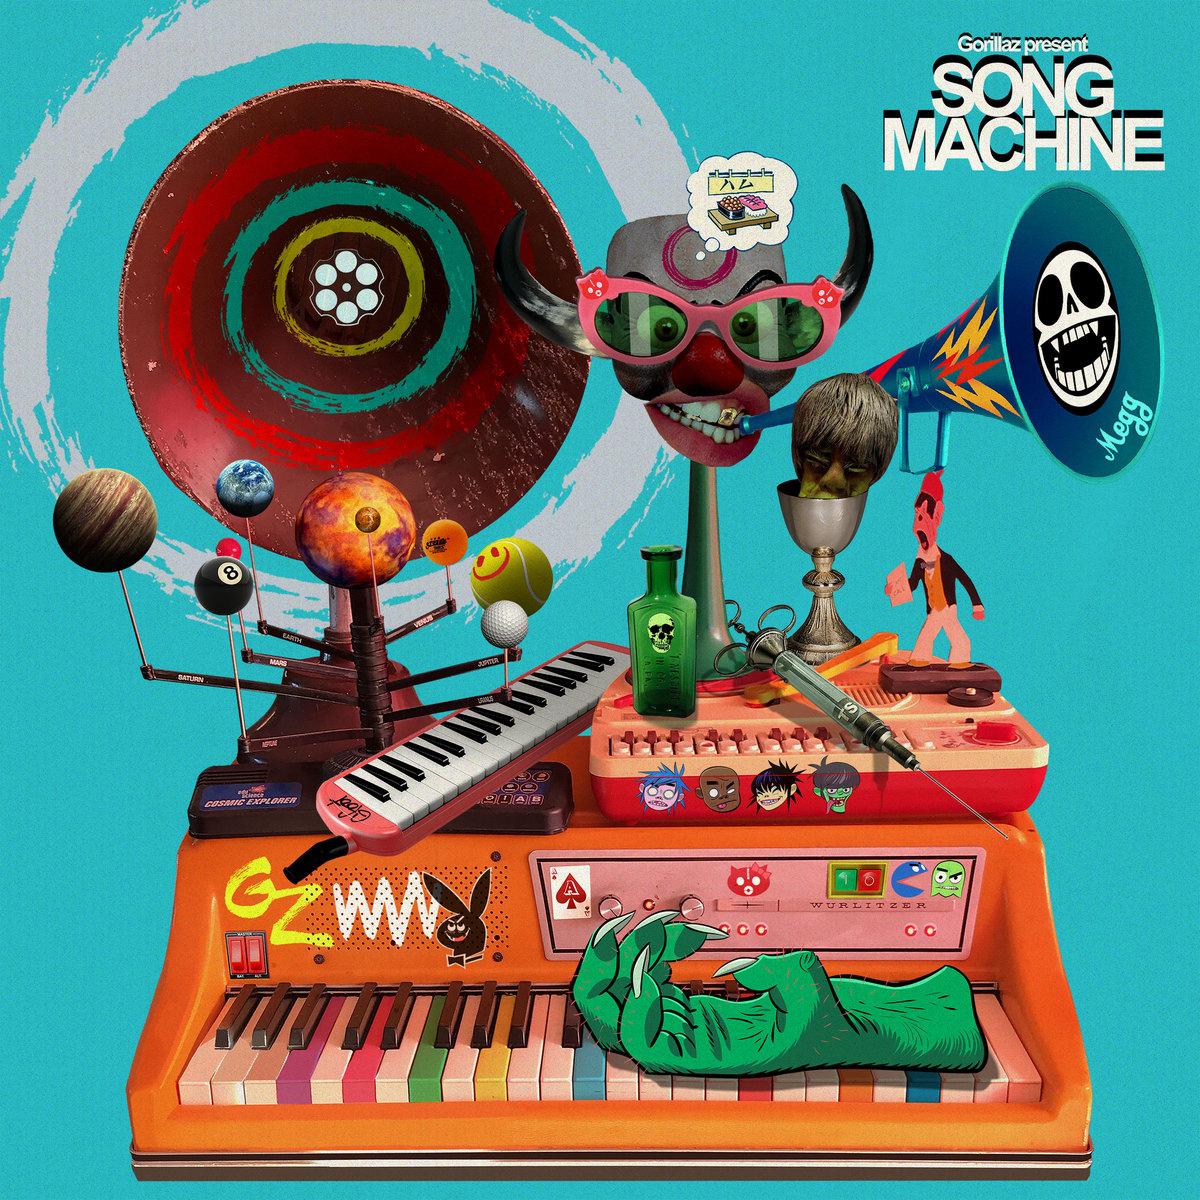 "Gorillaz Present Season One of Song Machine: ✨""STRANGE TIMEZ""✨ Pre order now 👉 https://t.co/ORlNde1Z4n https://t.co/38qllv4H3i"